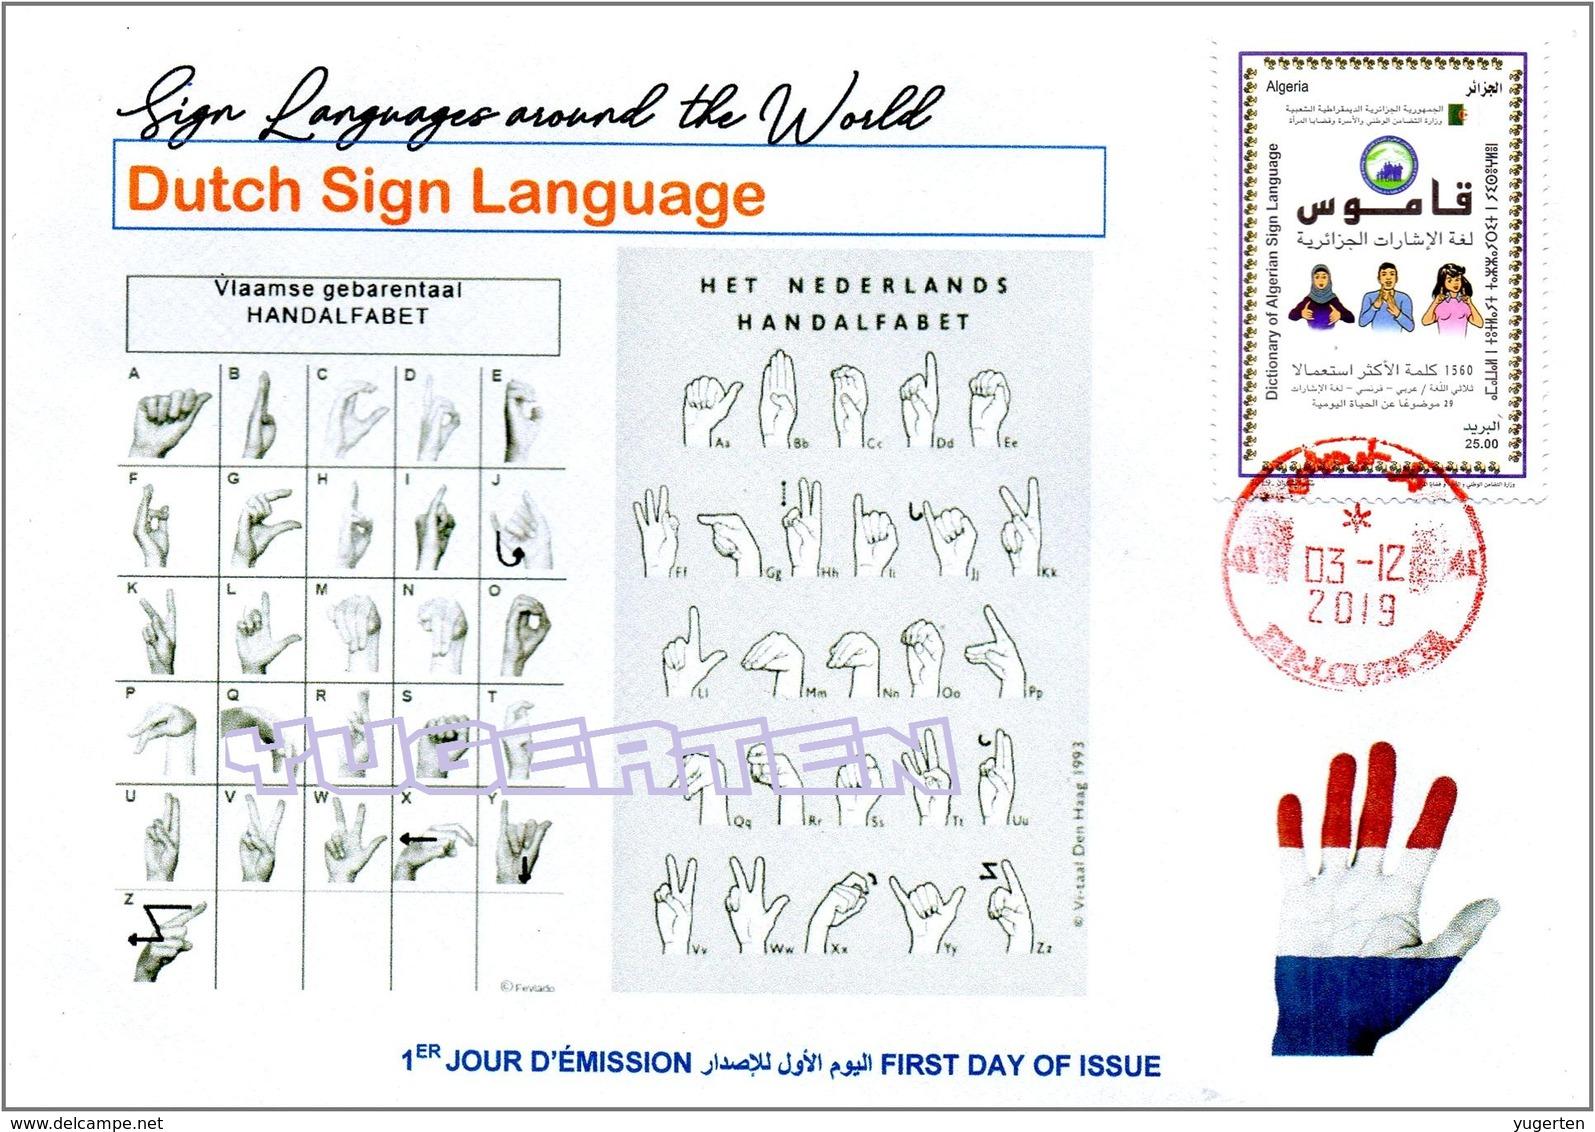 ALGERIA 2019 FDC Sign Language Netherlands Handicap Deafness Deaf Taubheit Surdité Taub Sordera Alphabet Disabled - Handicaps